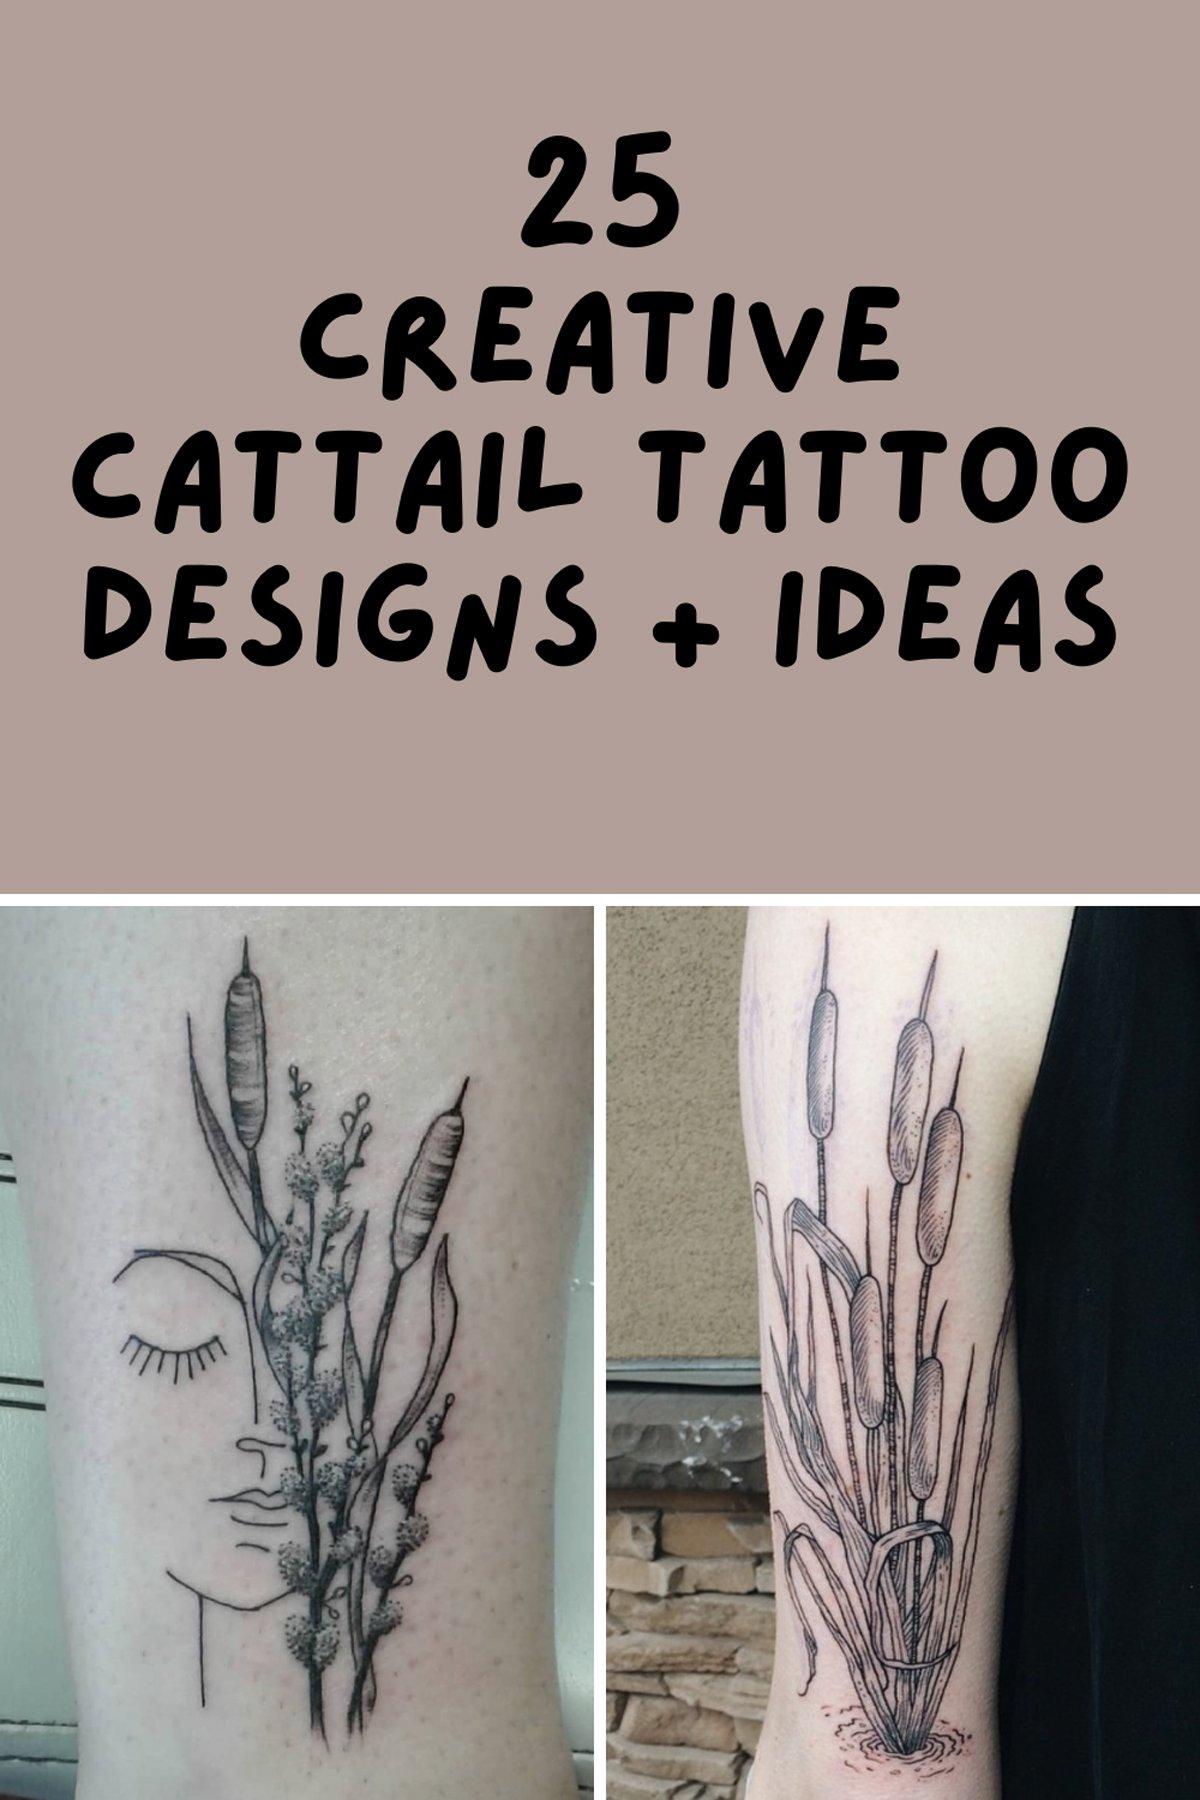 Creative Cattail Tattoo Designs